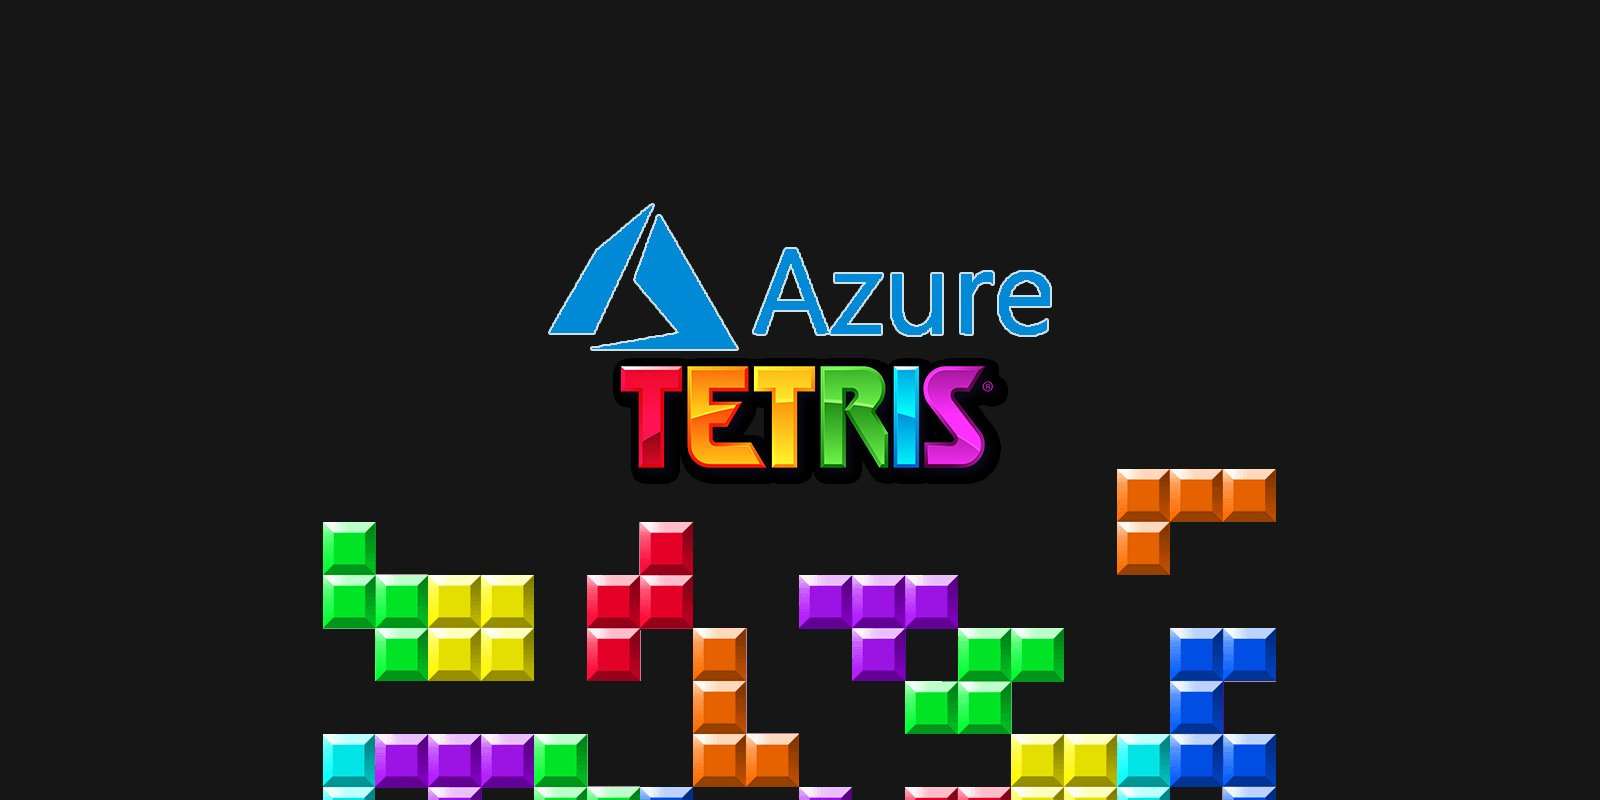 Azure Tetris